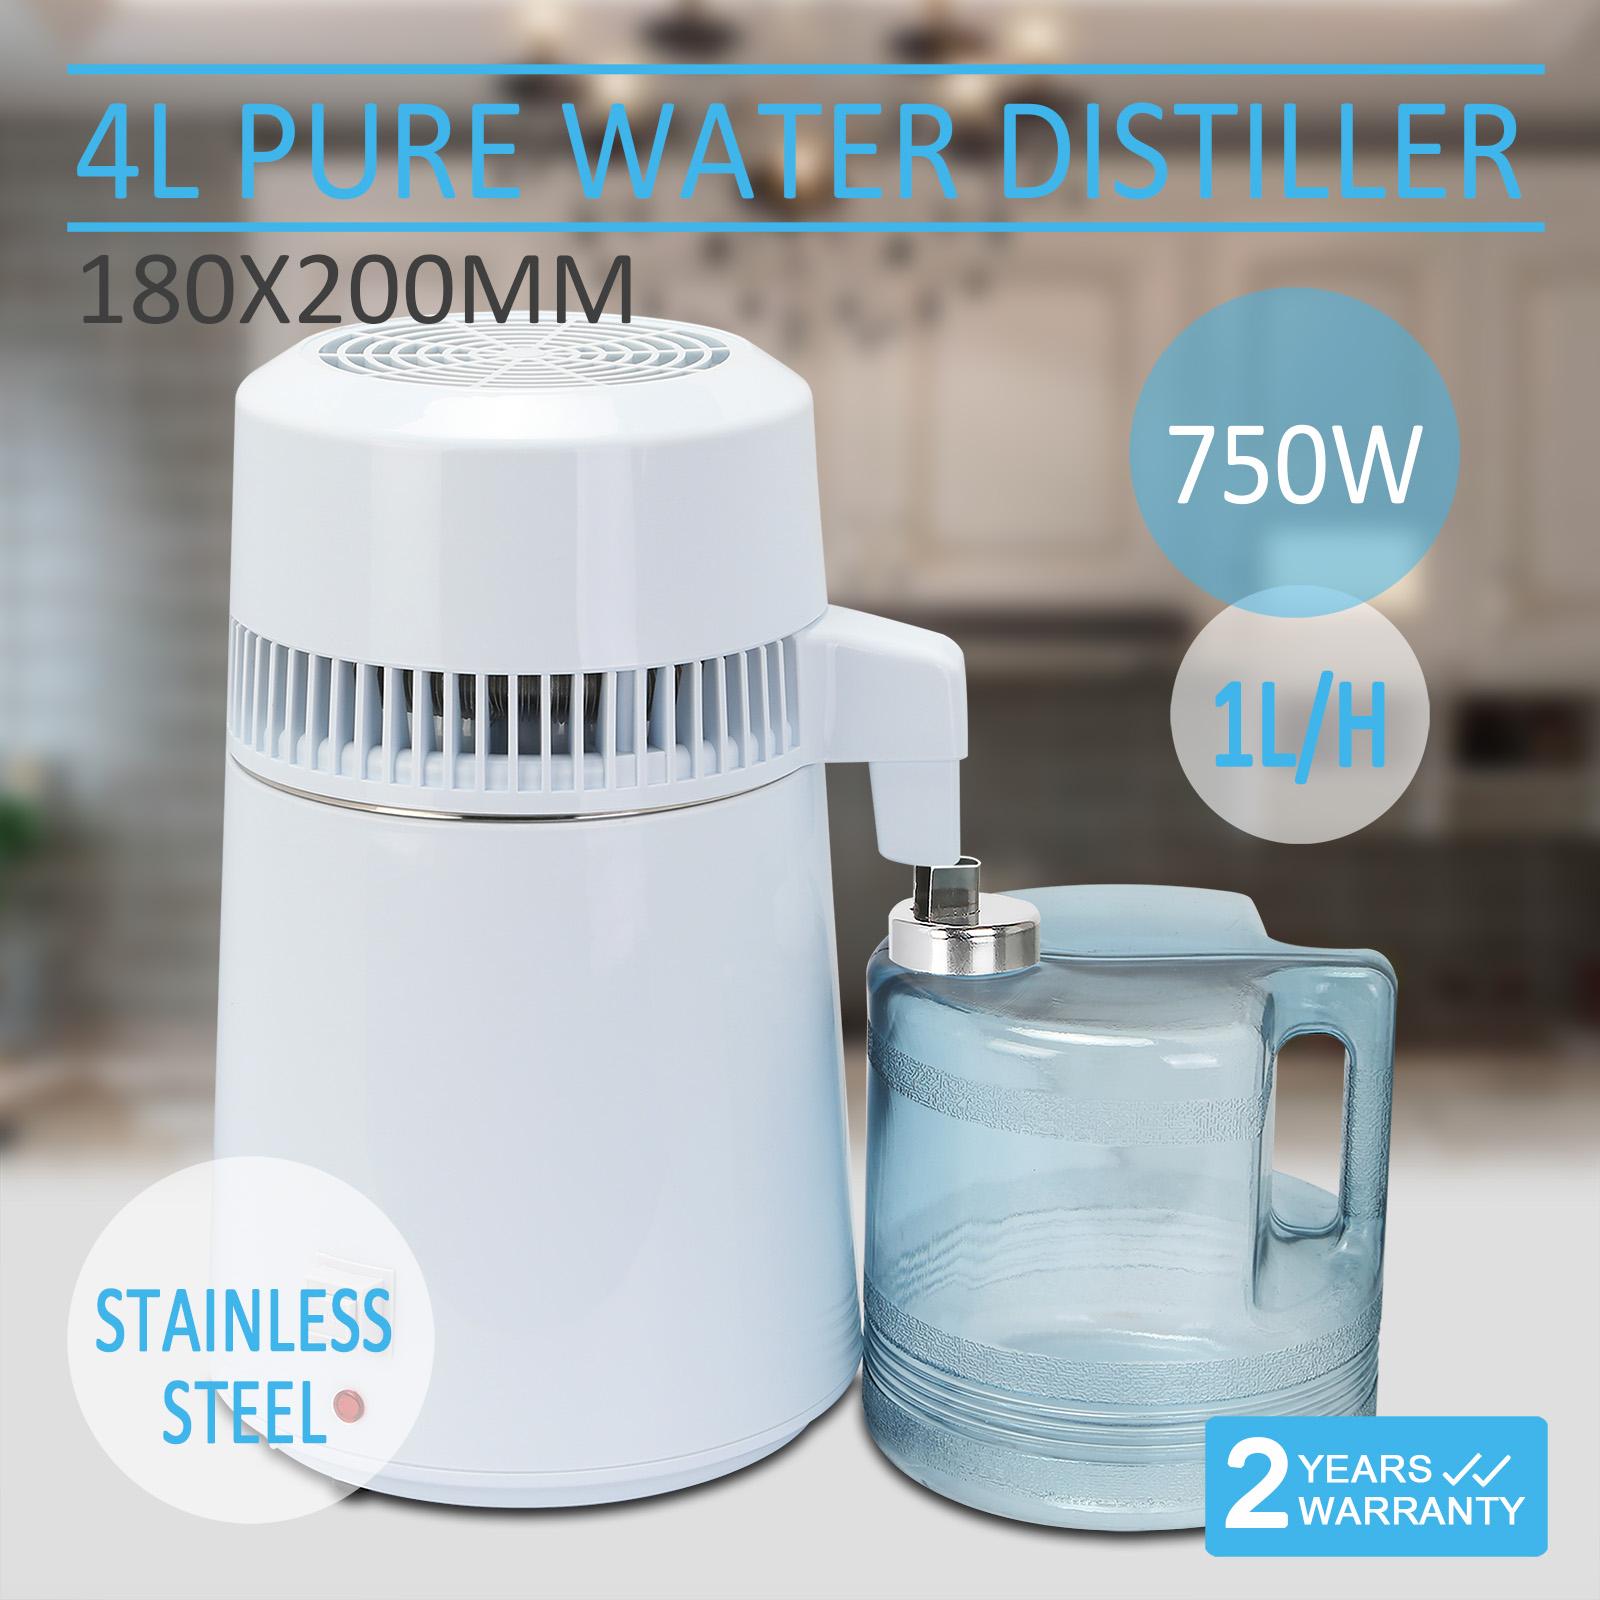 Water Distillation Units For Dental Office ~ Water distiller purifier l dental tool office stainless